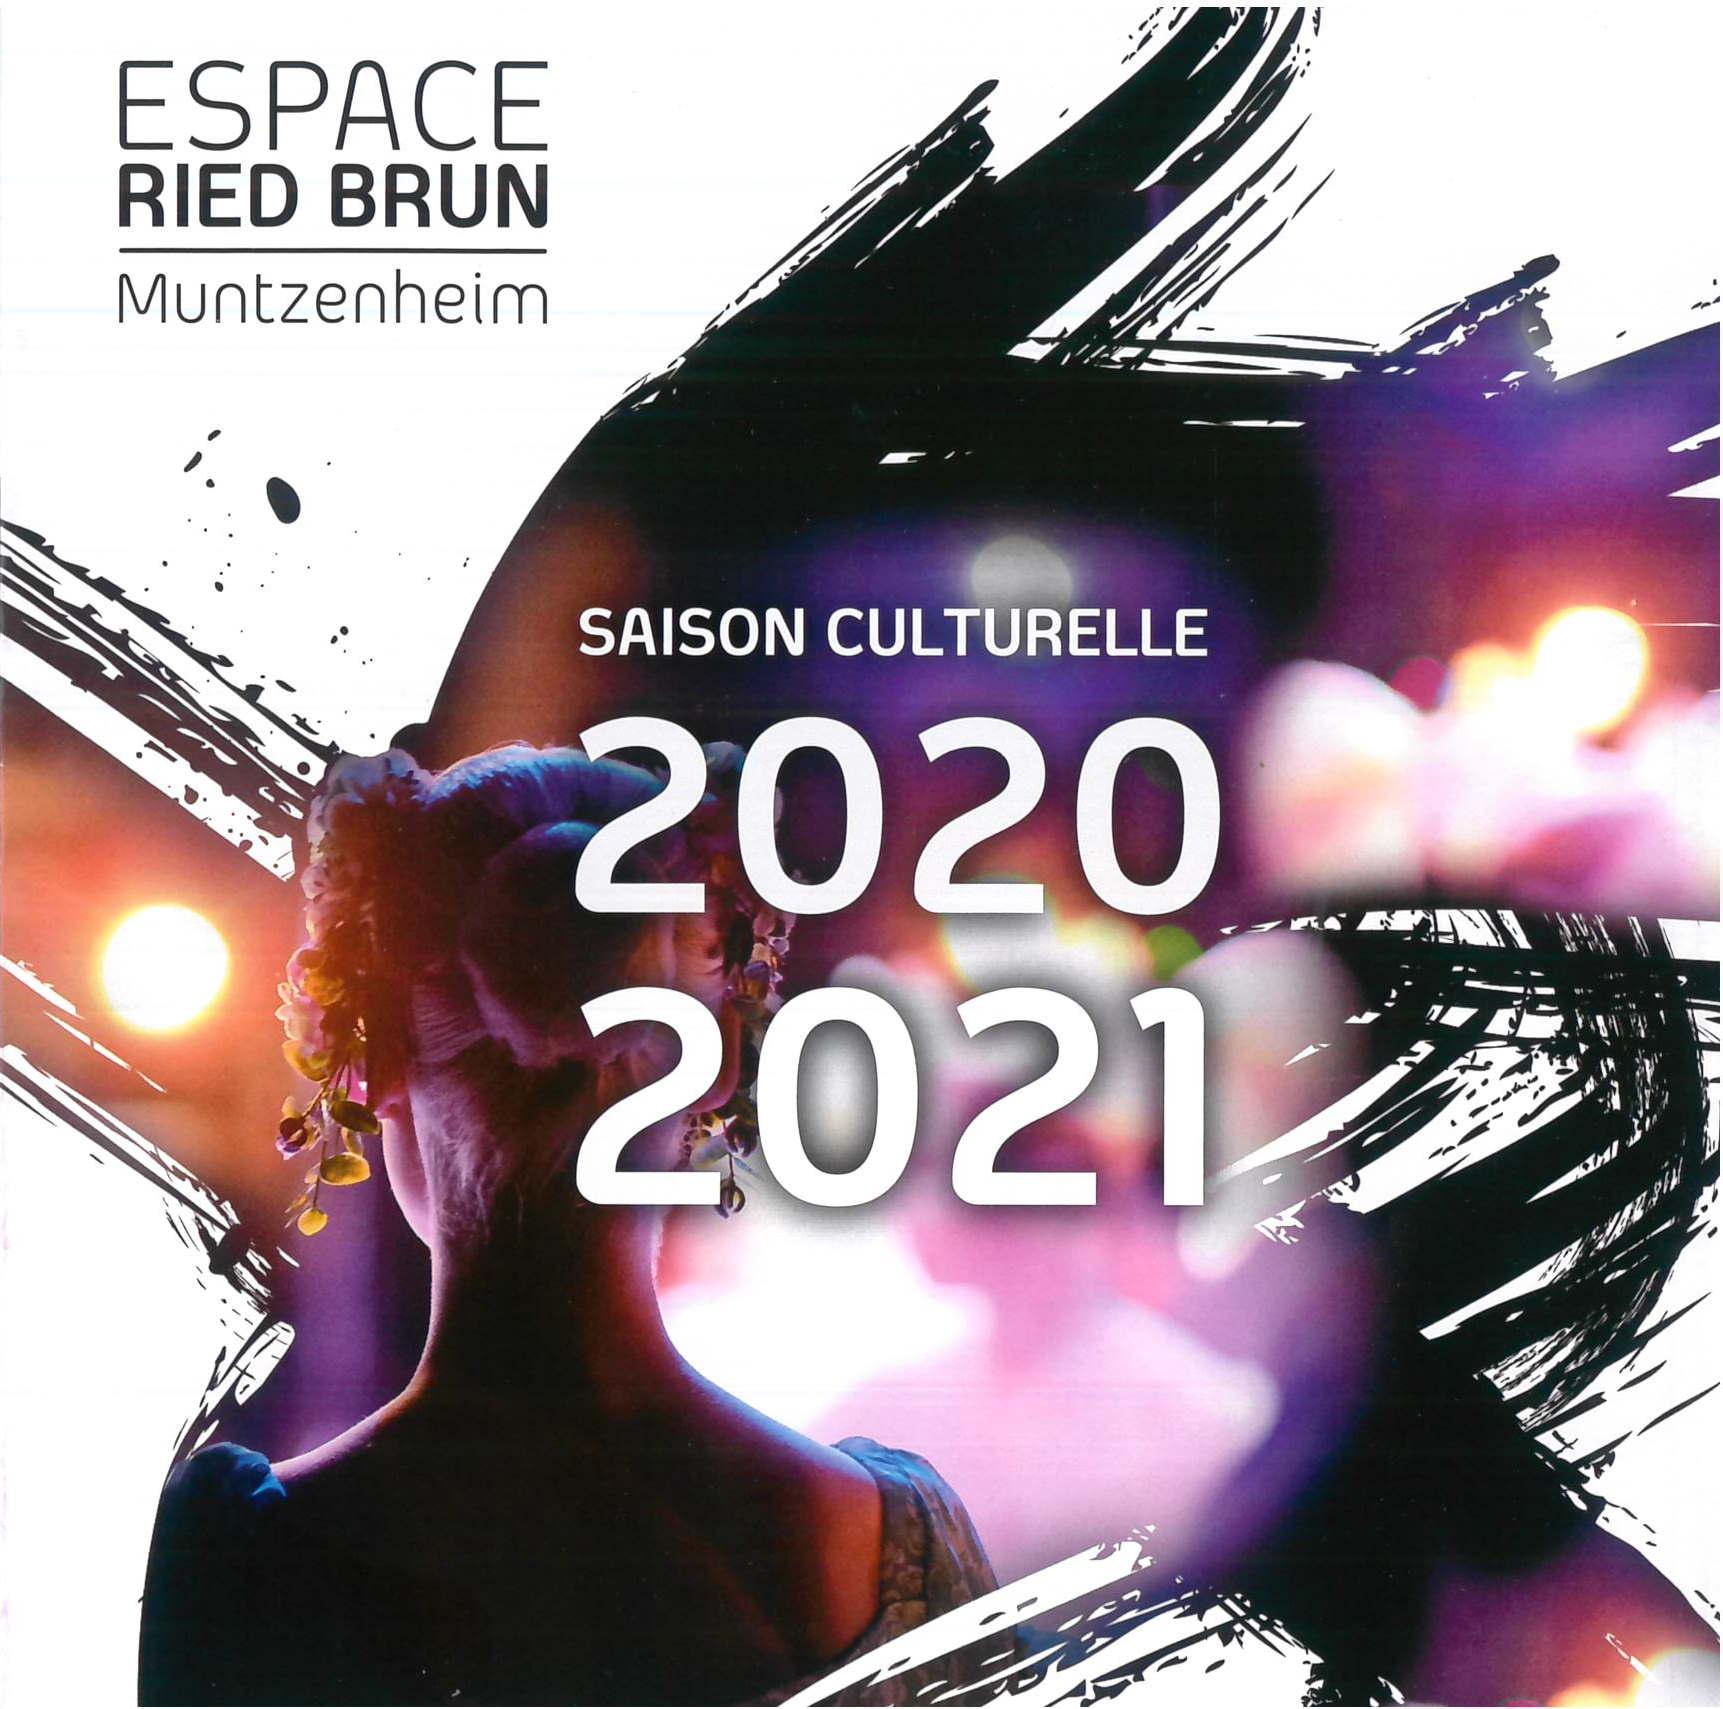 2020_ried_brun_entete.jpg